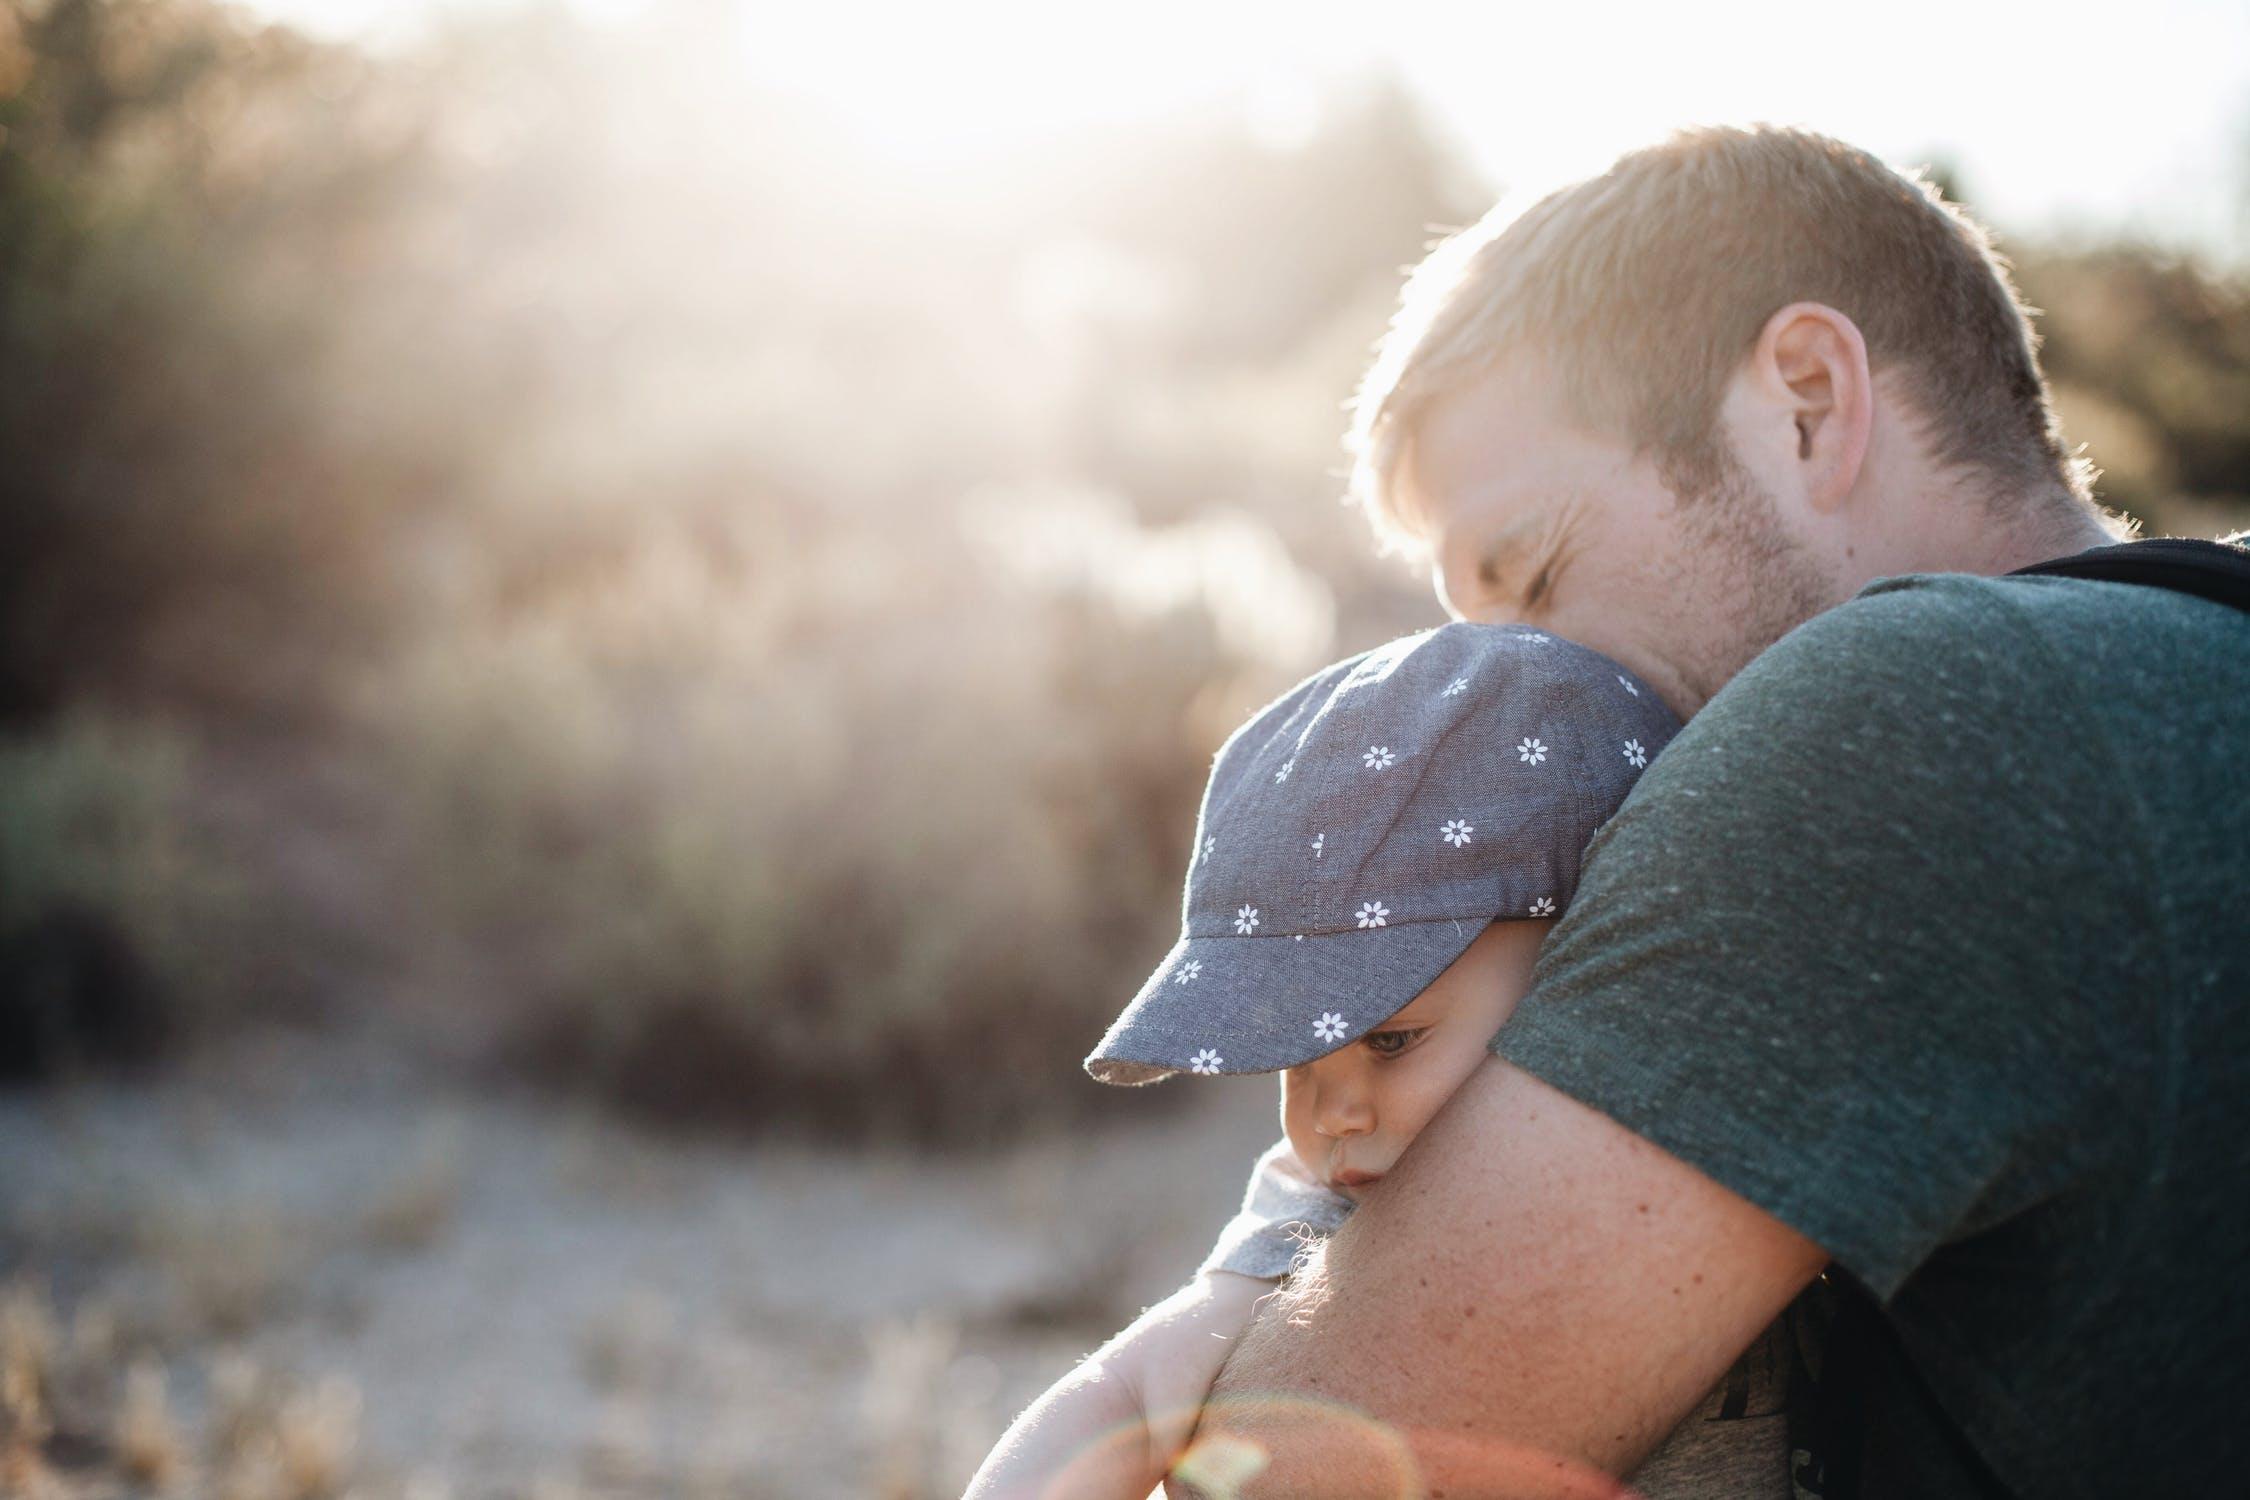 maternidad y paternidad IRPF